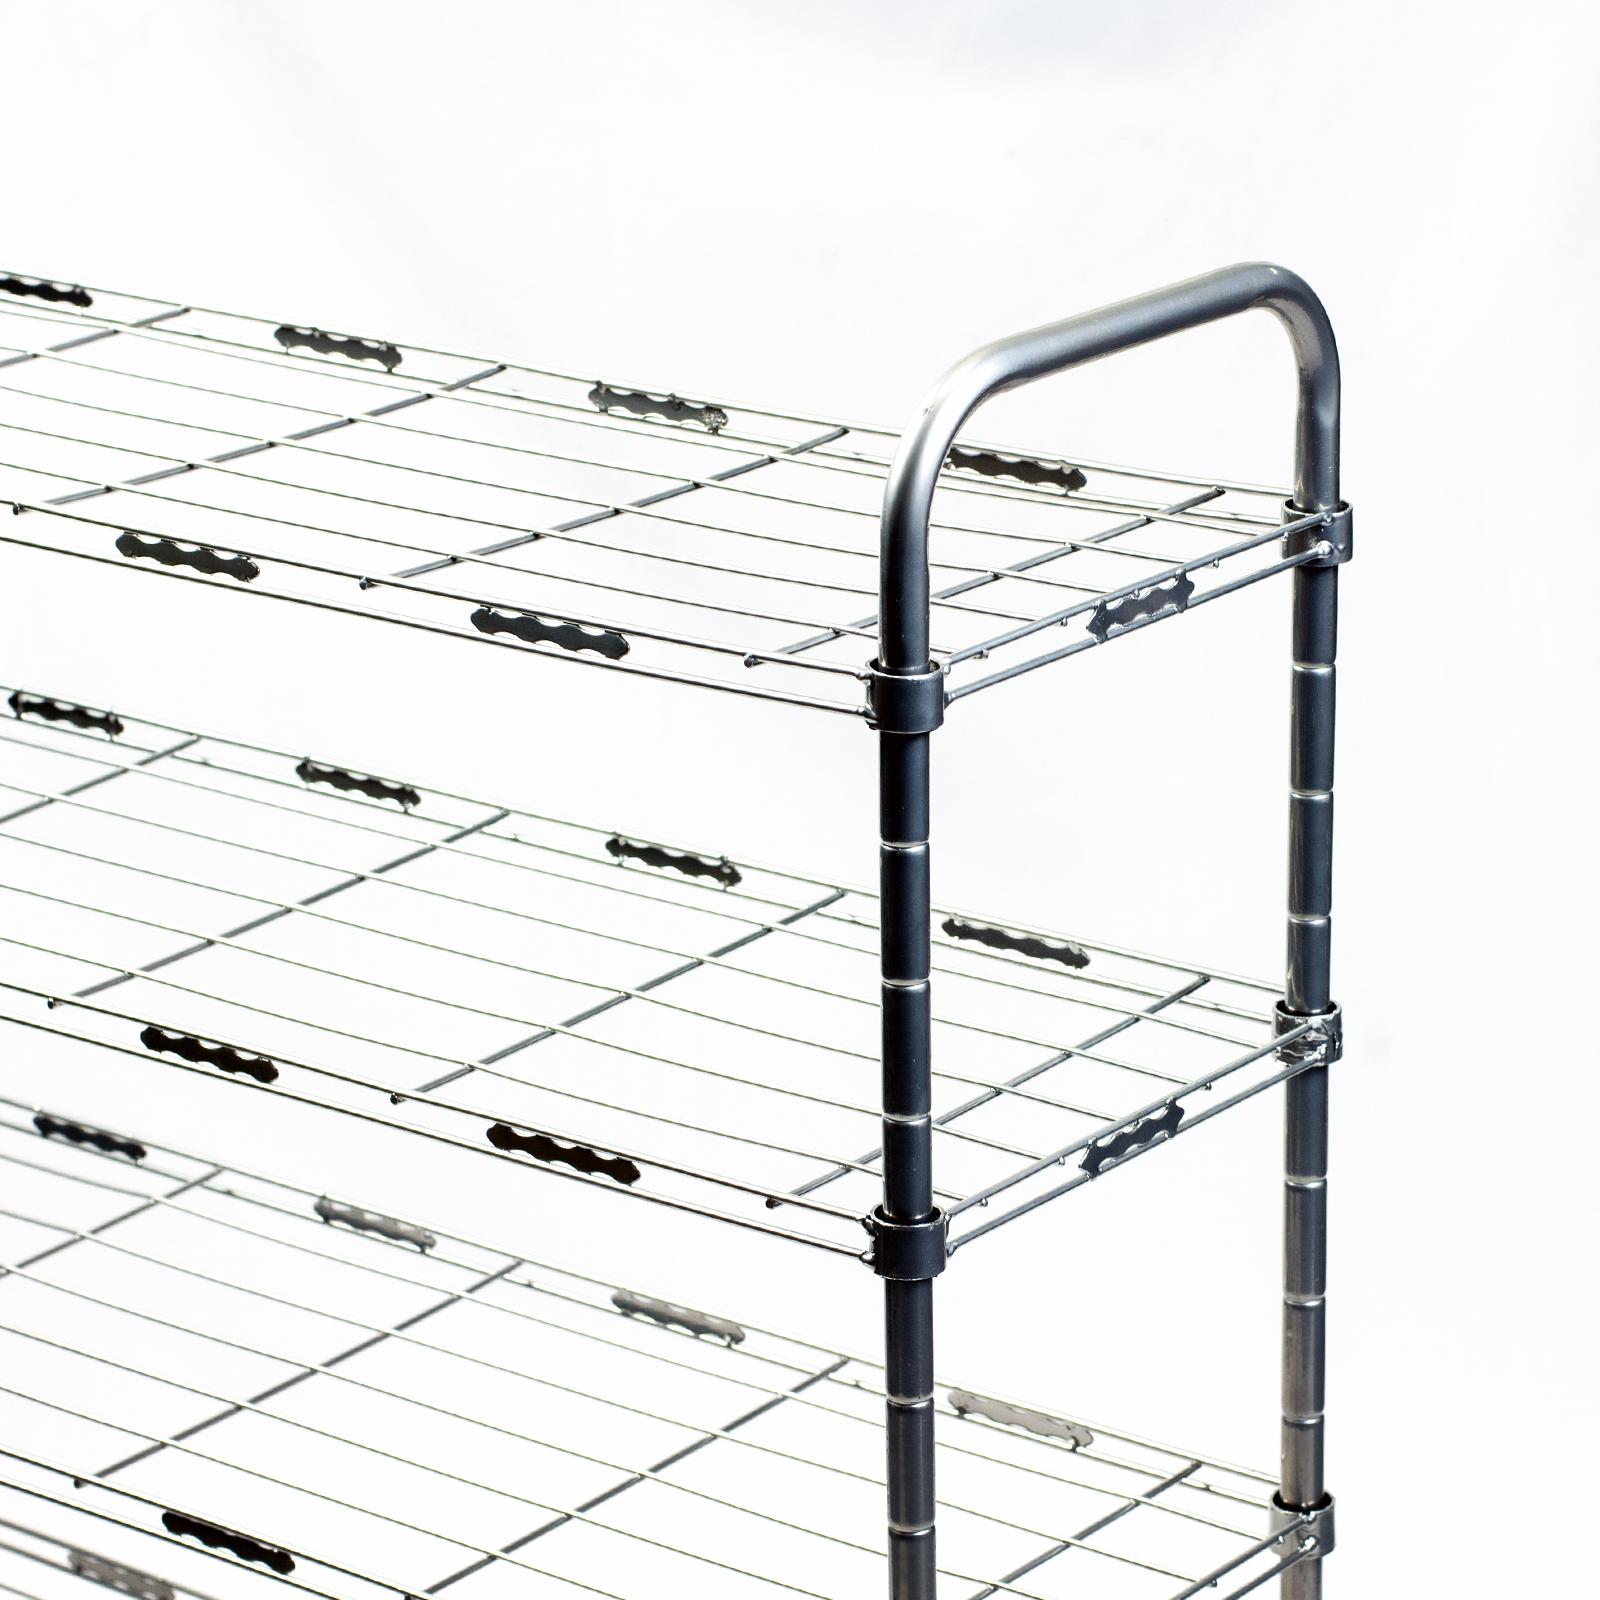 3 4 5 Tier Steel Shoe Shelf Tower Rack Closet Organizer